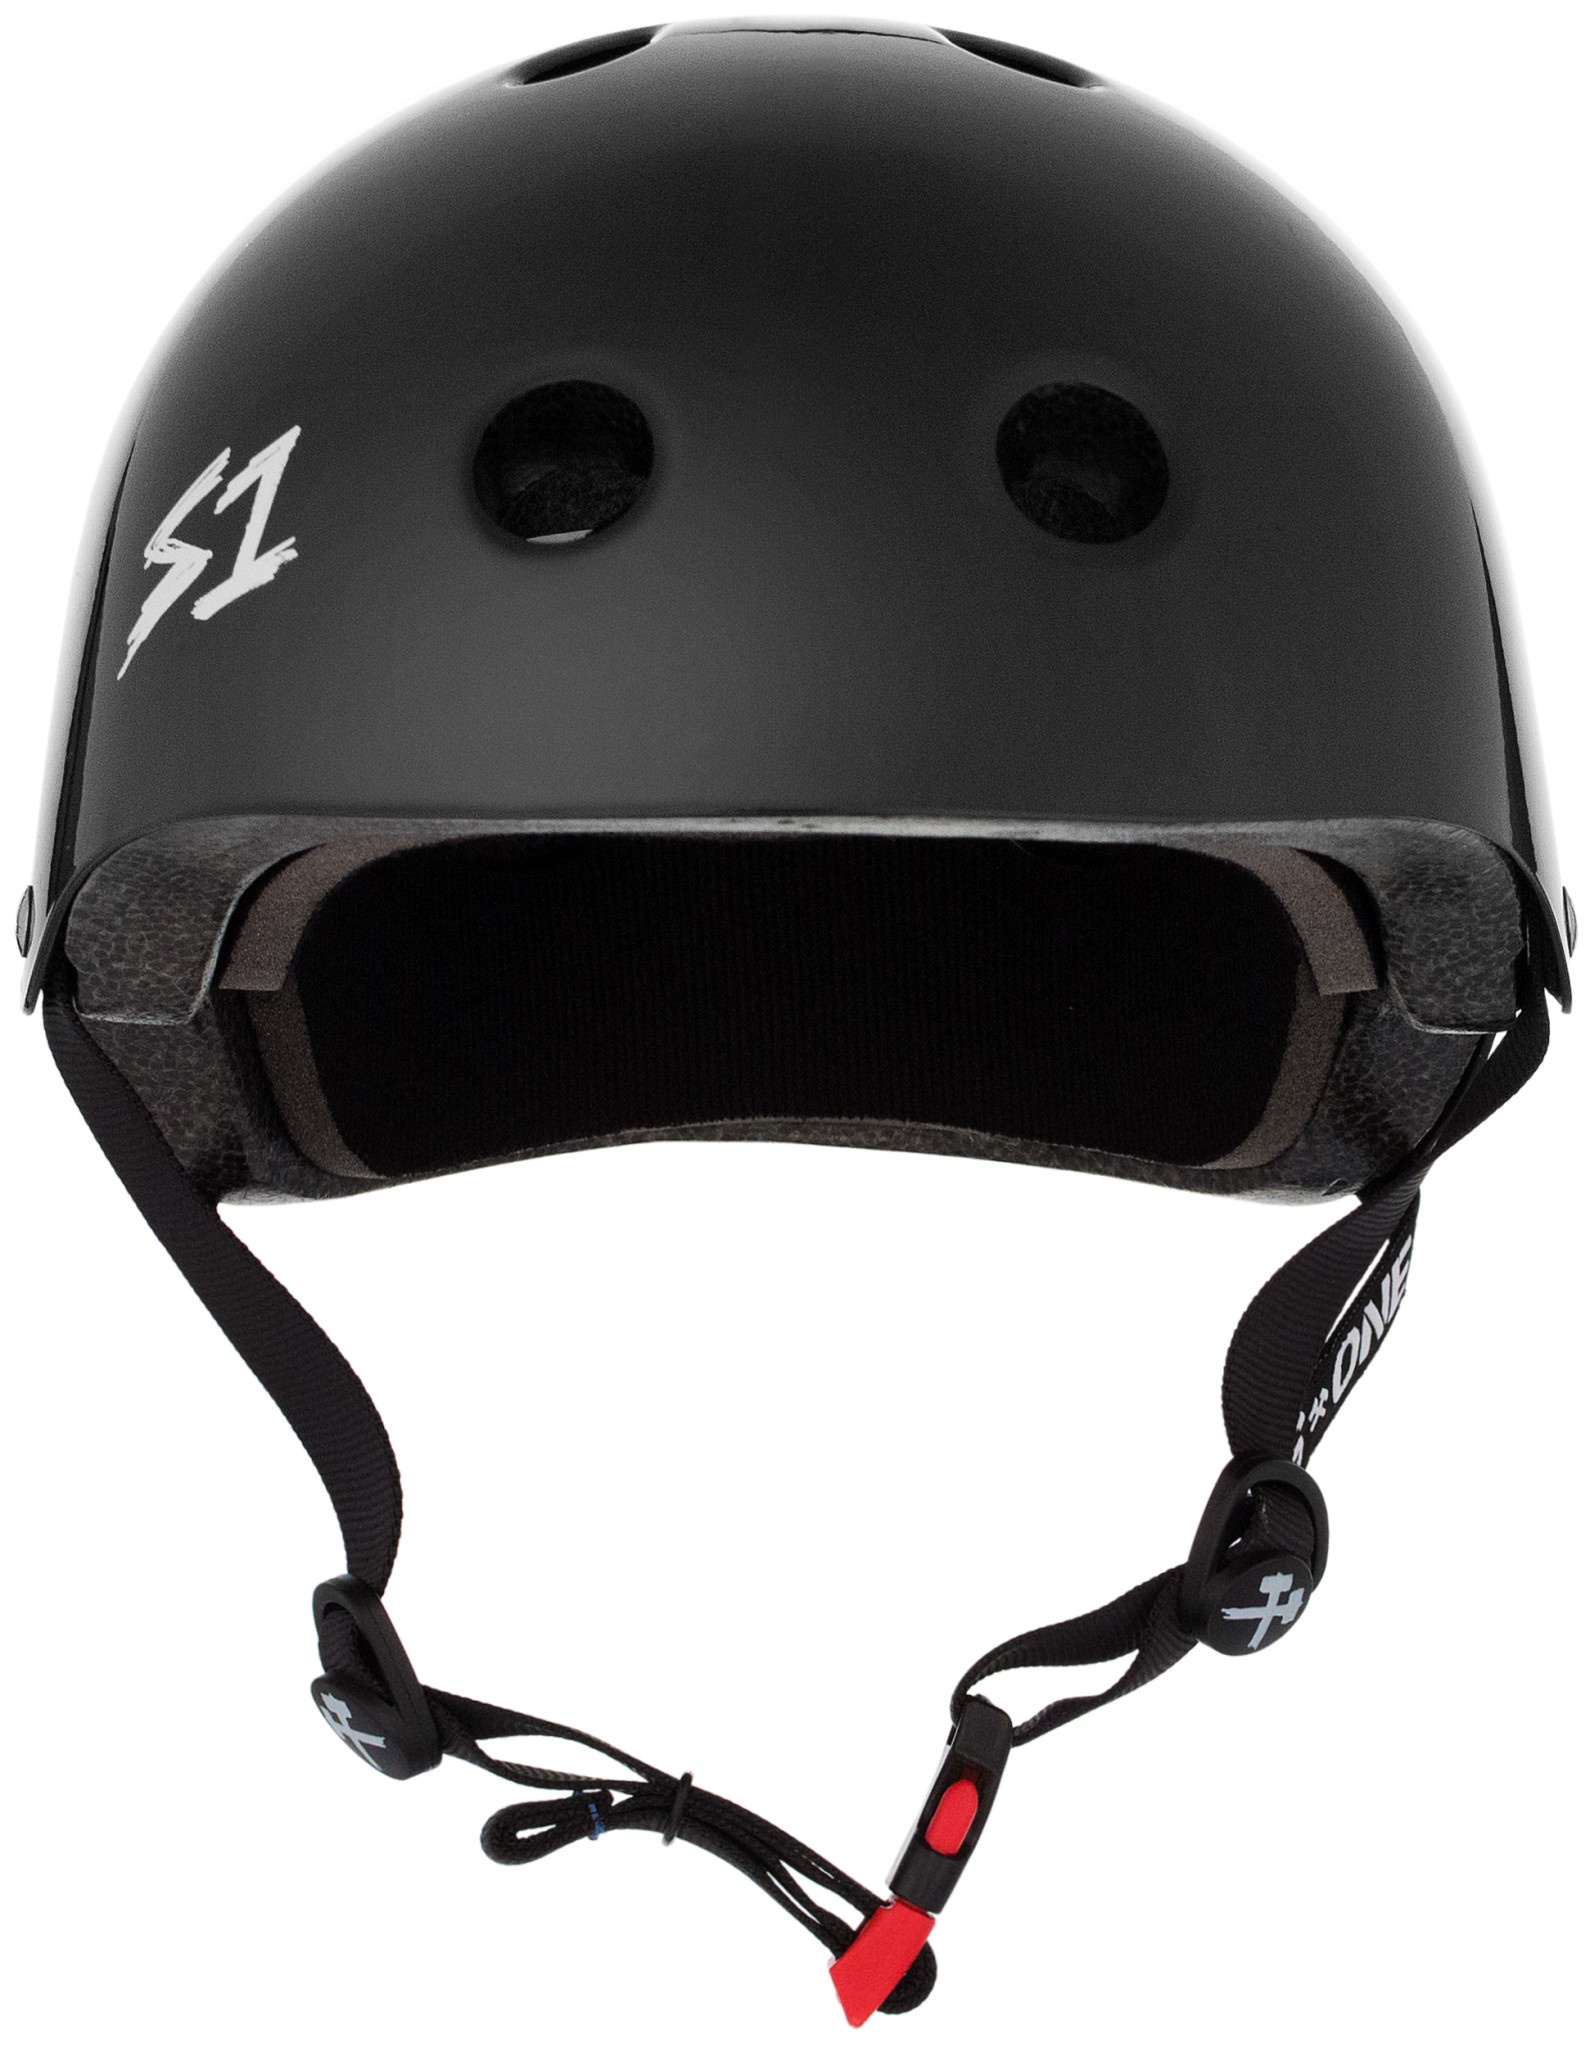 S-1 Mini Lifer Helmet - Black Gloss